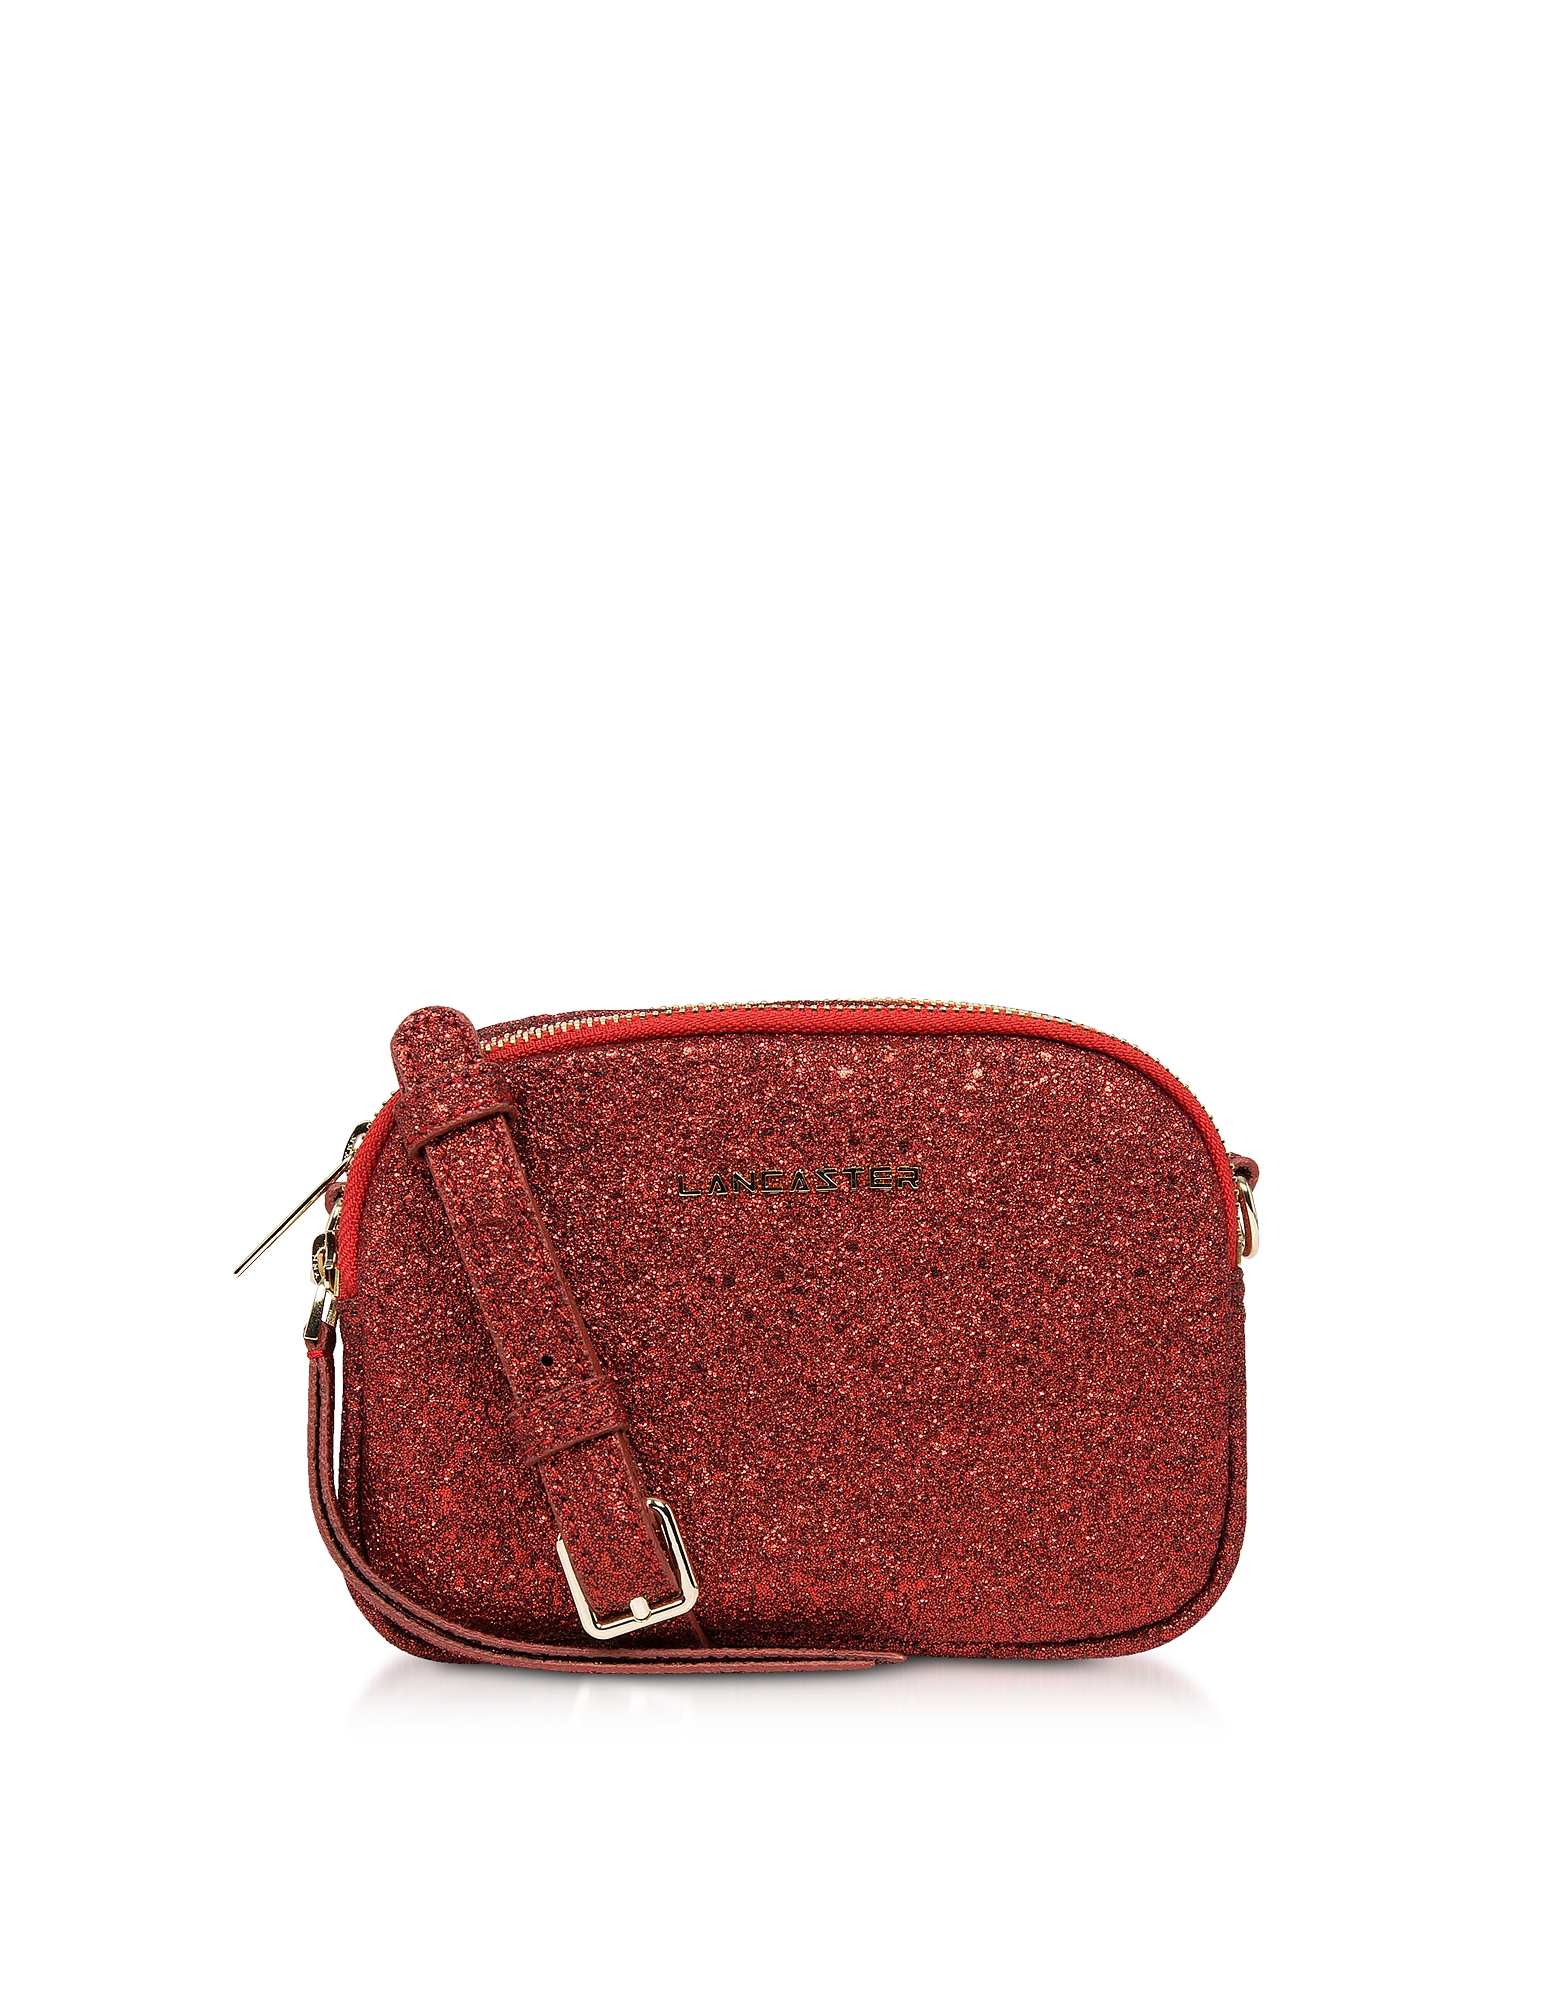 Lancaster Paris Designer Handbags, Actual Shiny Mini Crossbody Bag